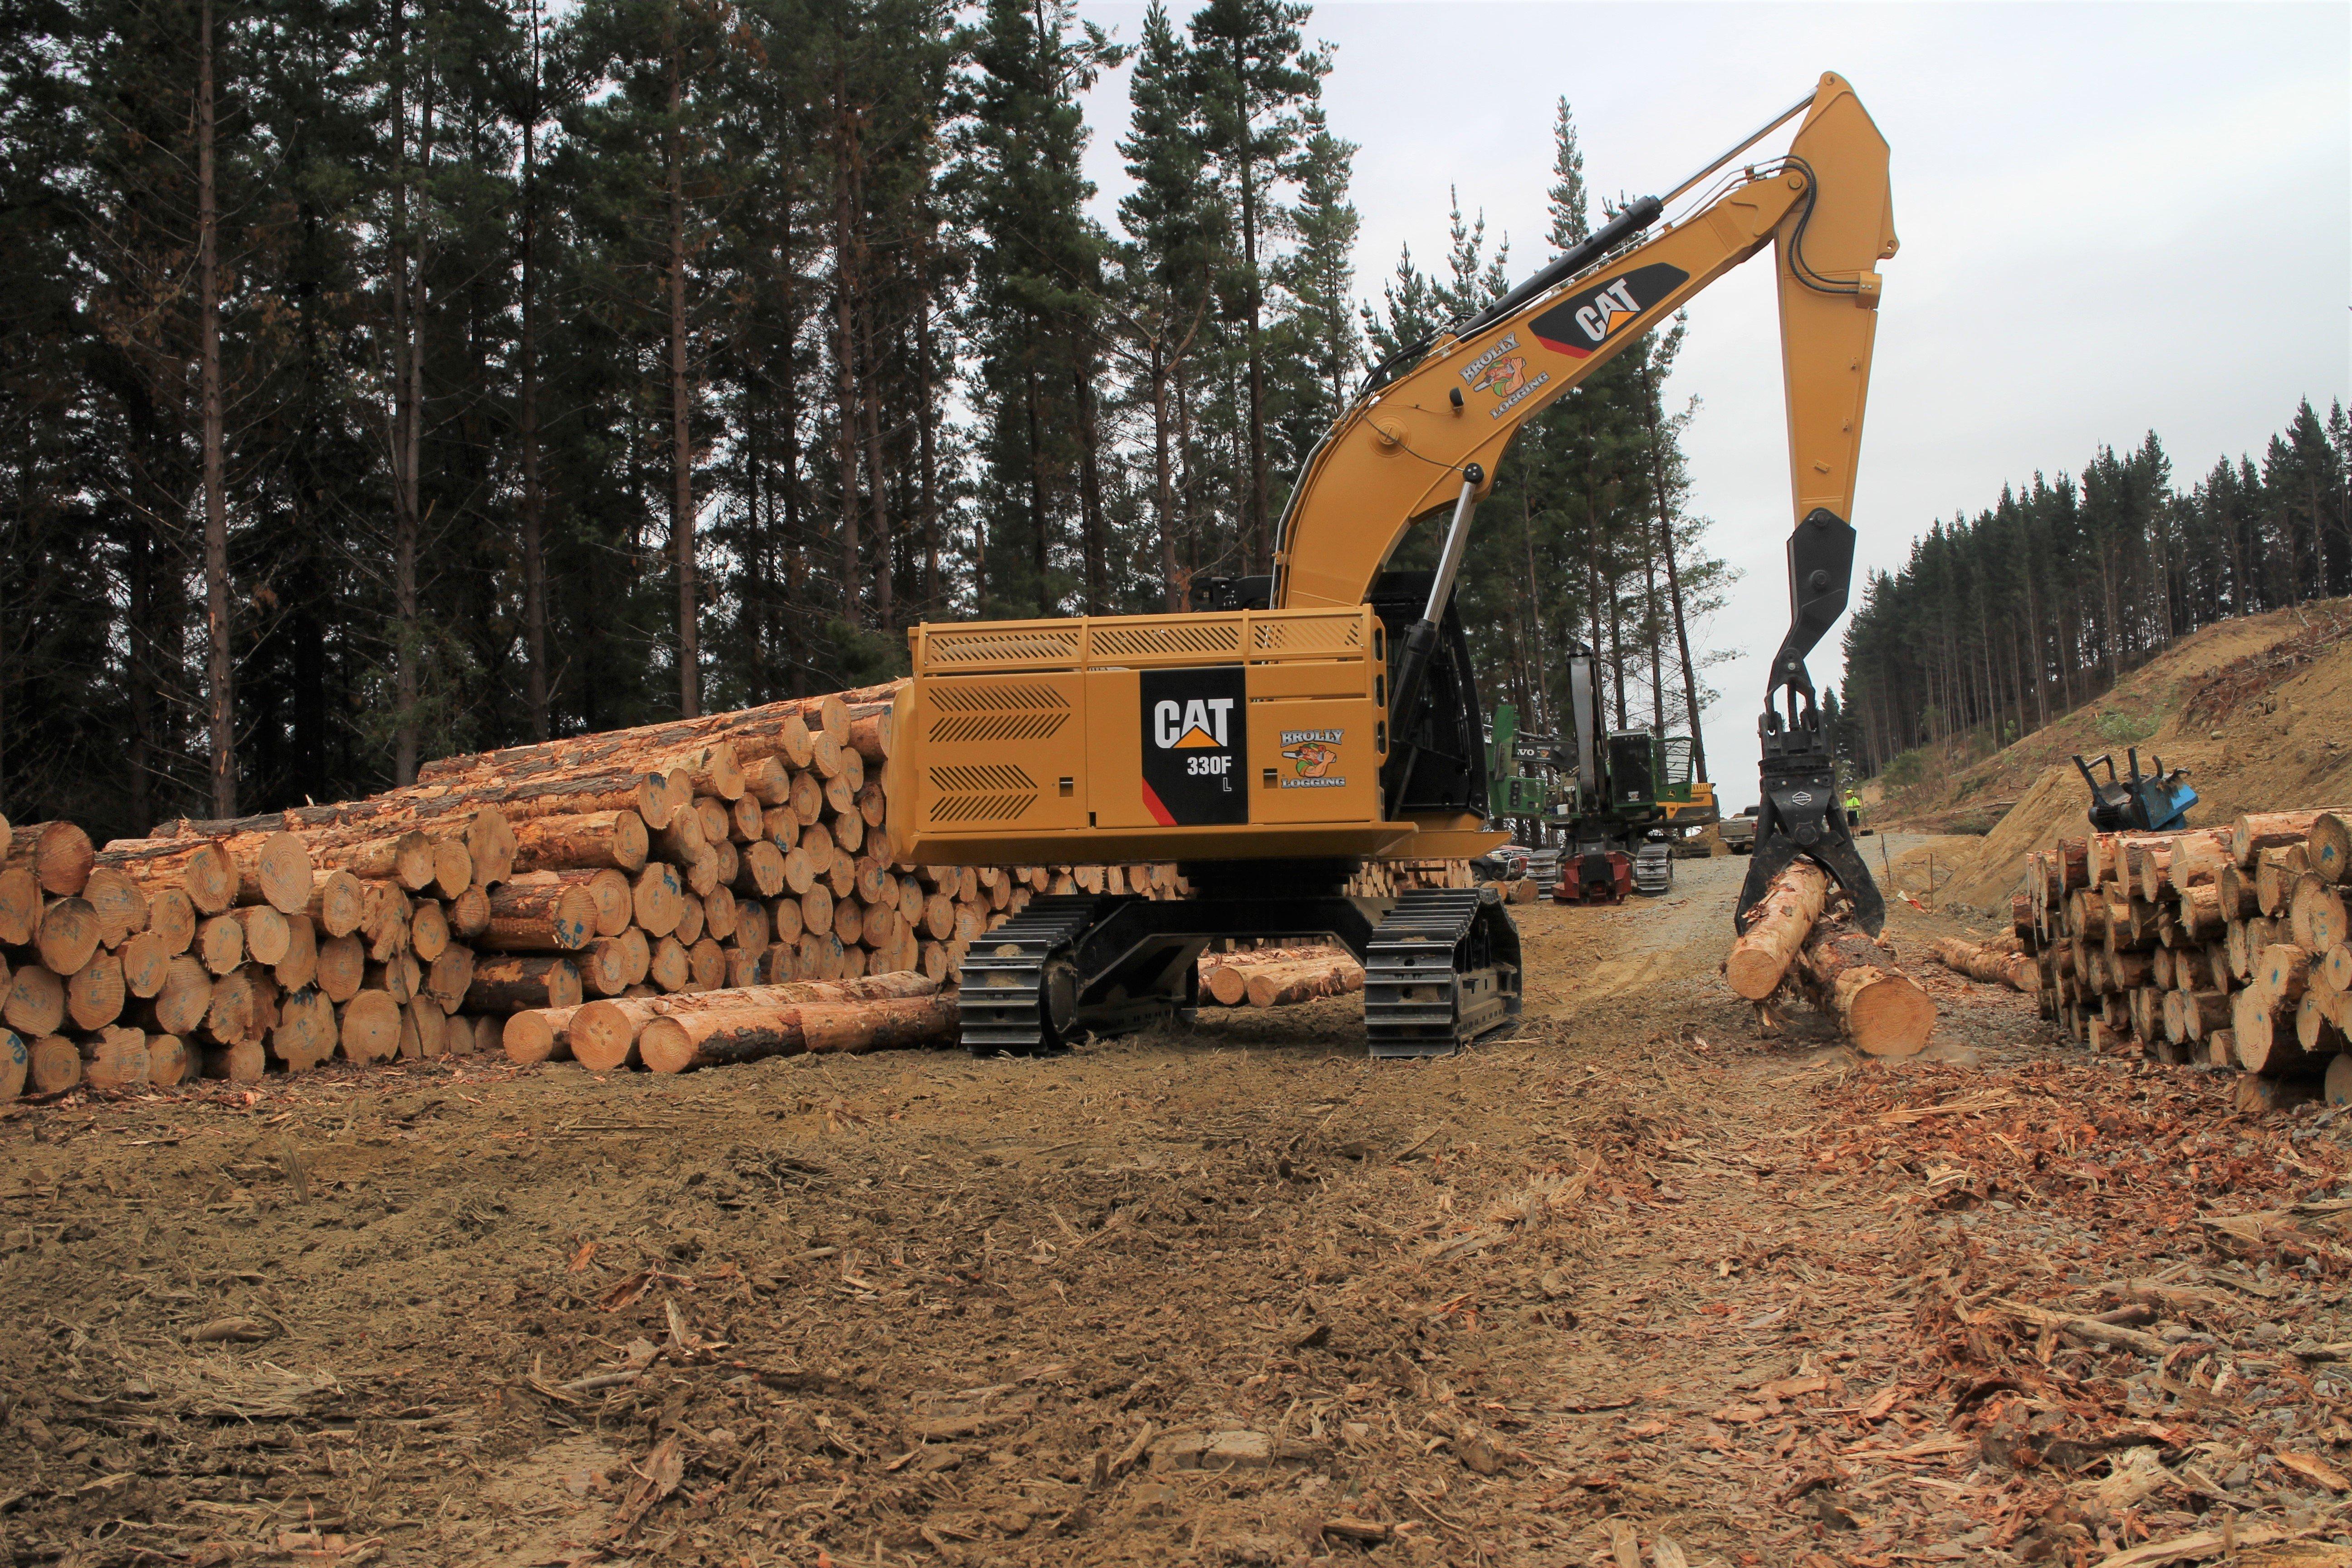 Brolly Logging Cat Loader